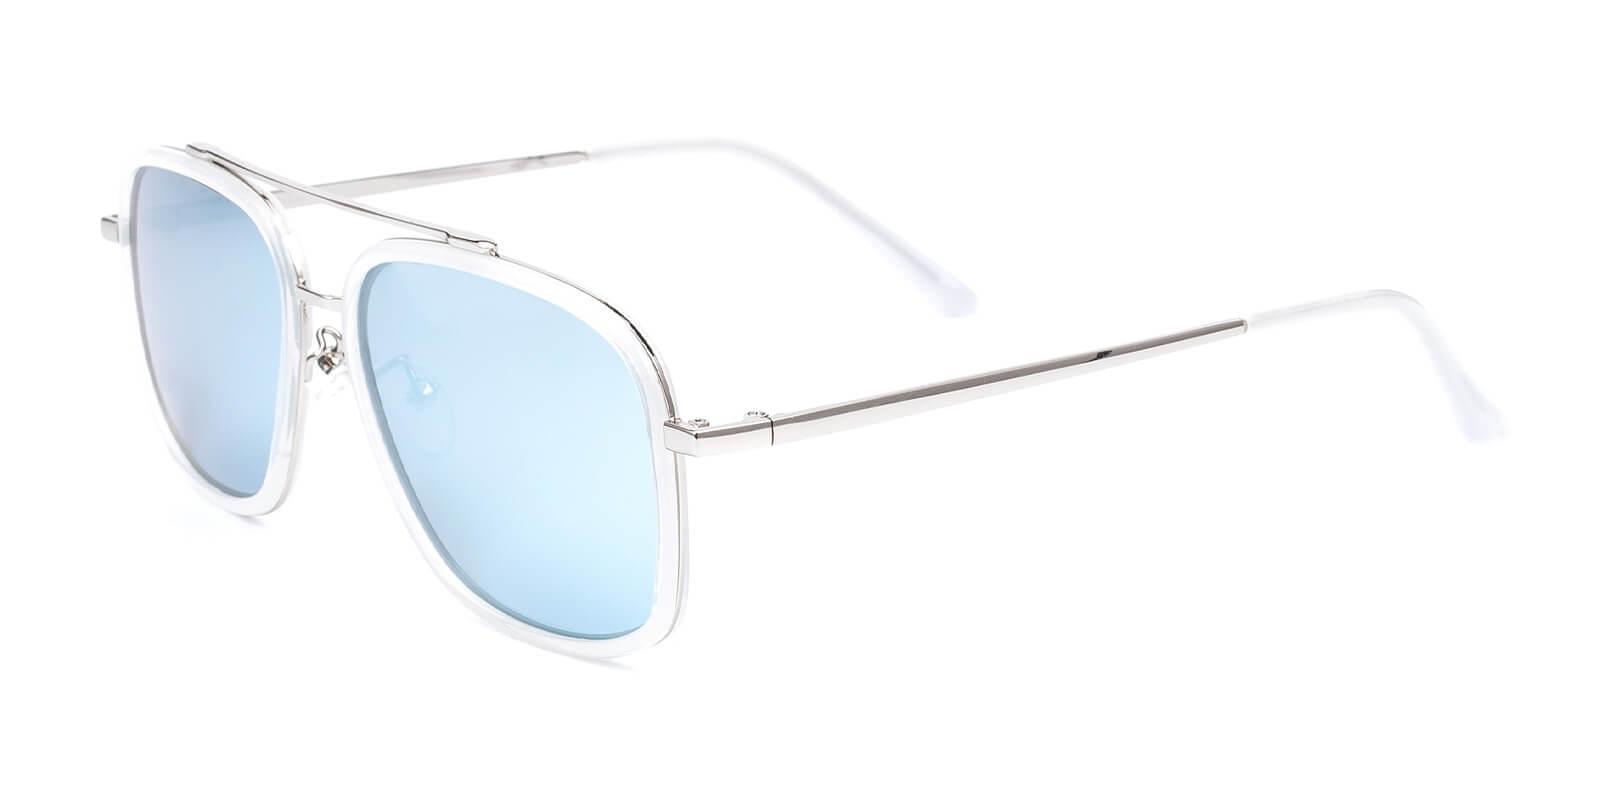 Clinton-Translucent-Aviator-Metal / Combination / TR-Sunglasses-additional1